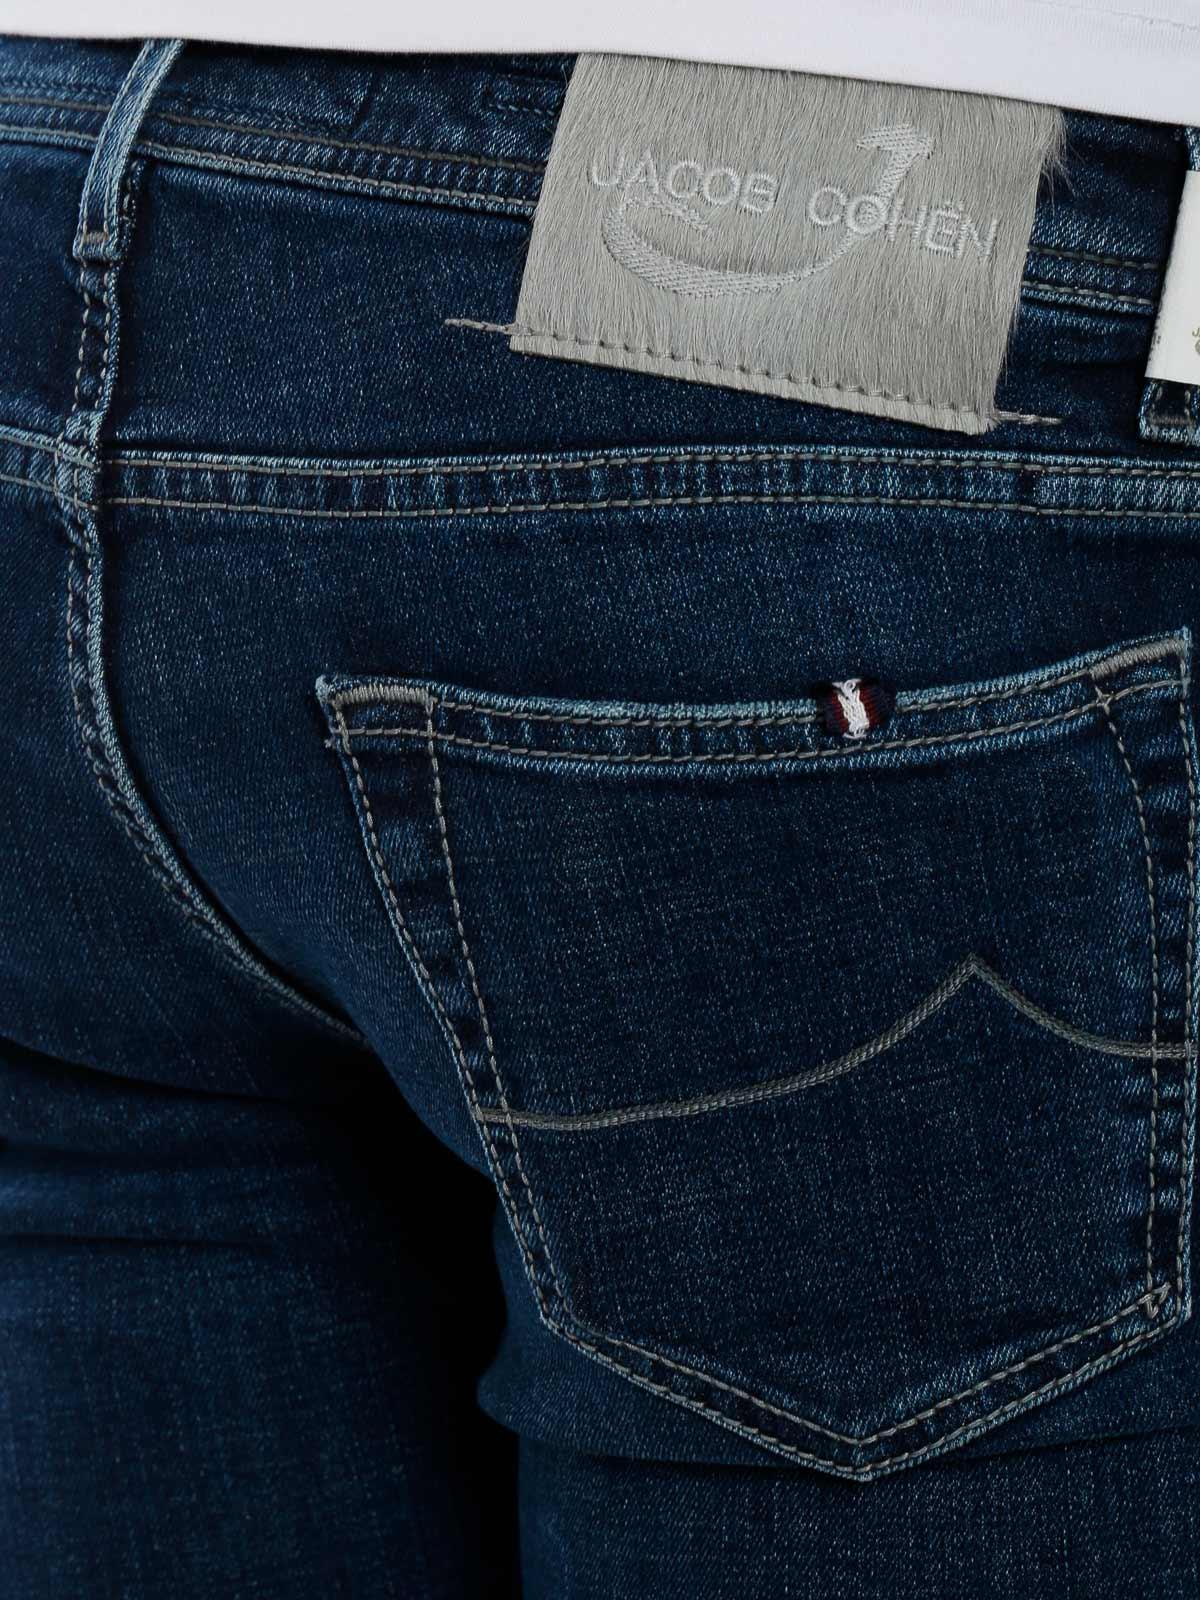 nuovo stile 5875e a8f14 JACOB COHEN Jeans Uomo Style 622